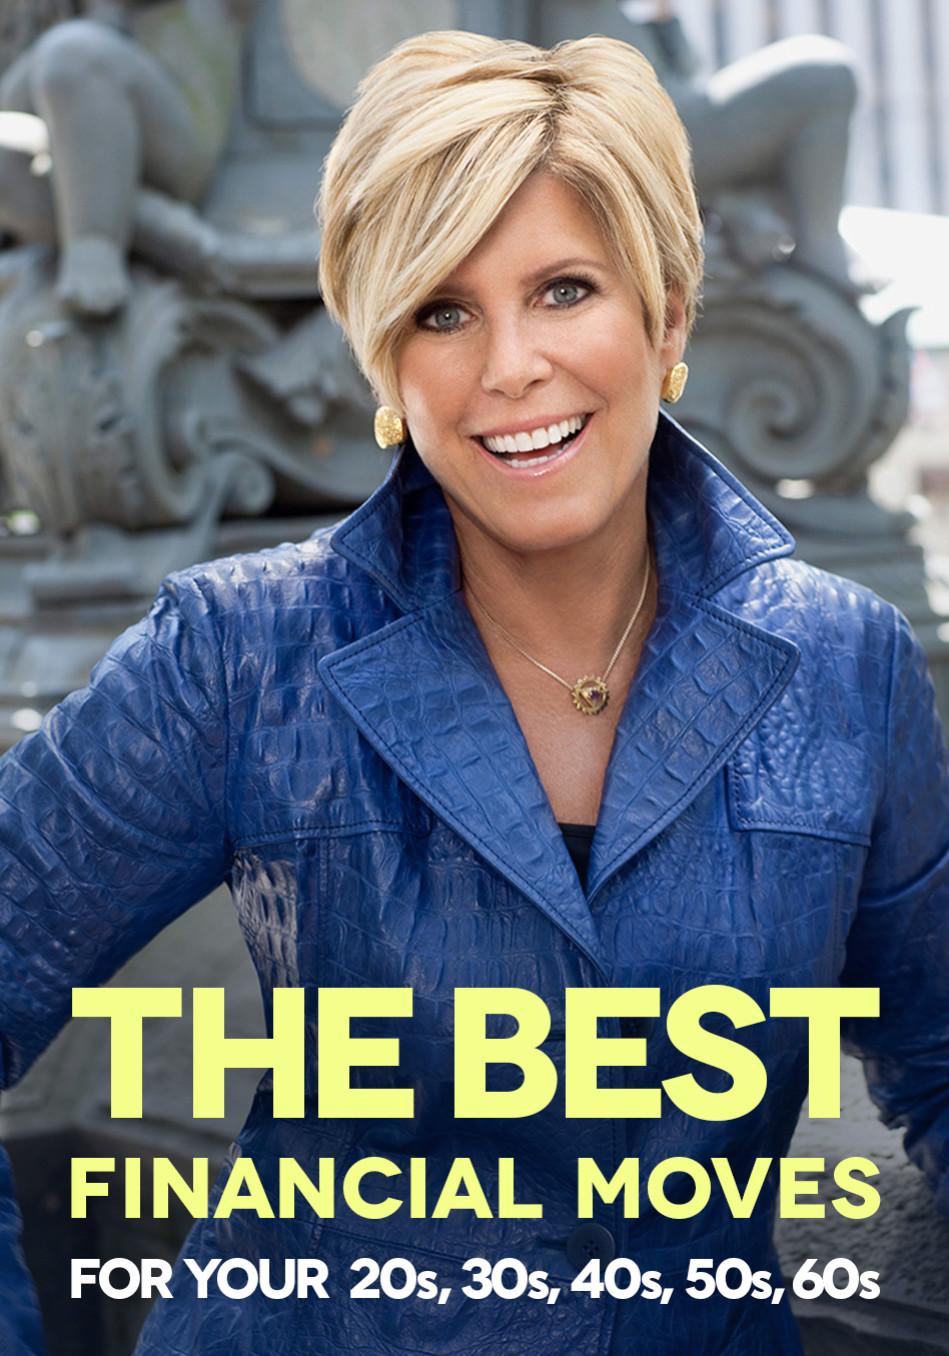 https://static.oprah.com/2016/09/201609-omag-suze-best-financial-moves1-949x1356.jpg